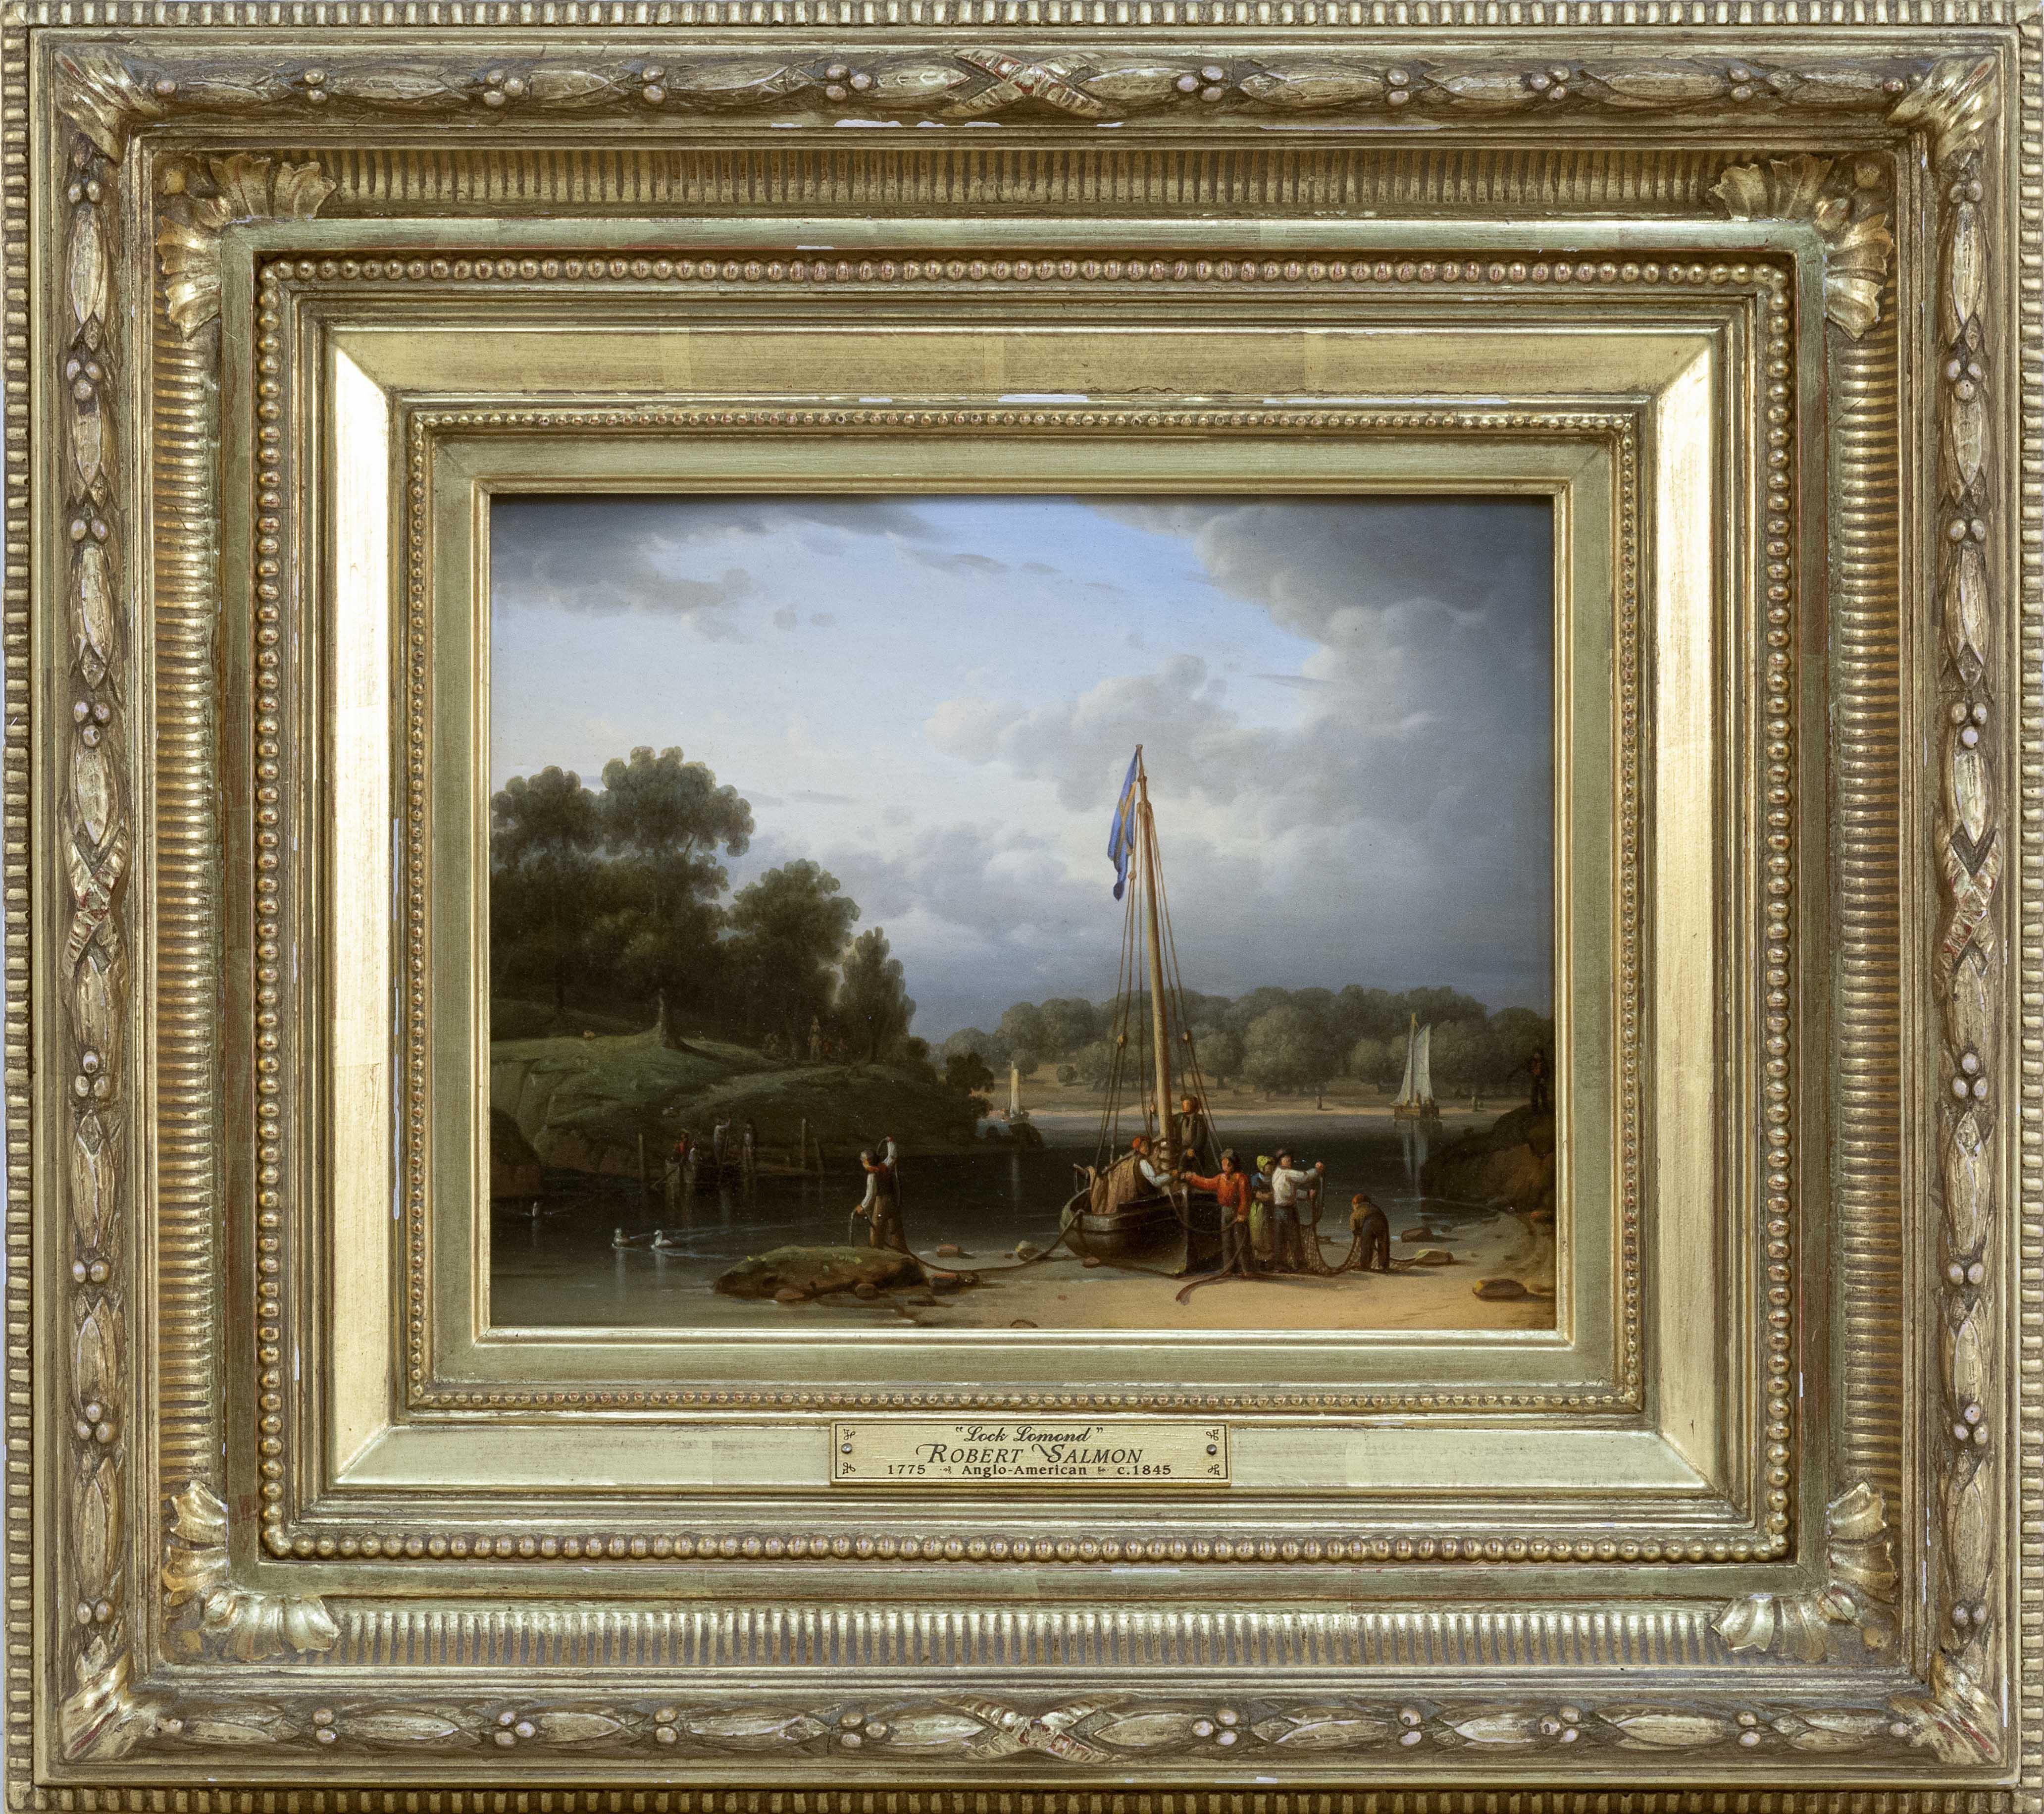 ROBERT SALMON (Massachusetts/United Kingdom, 1775-1848),